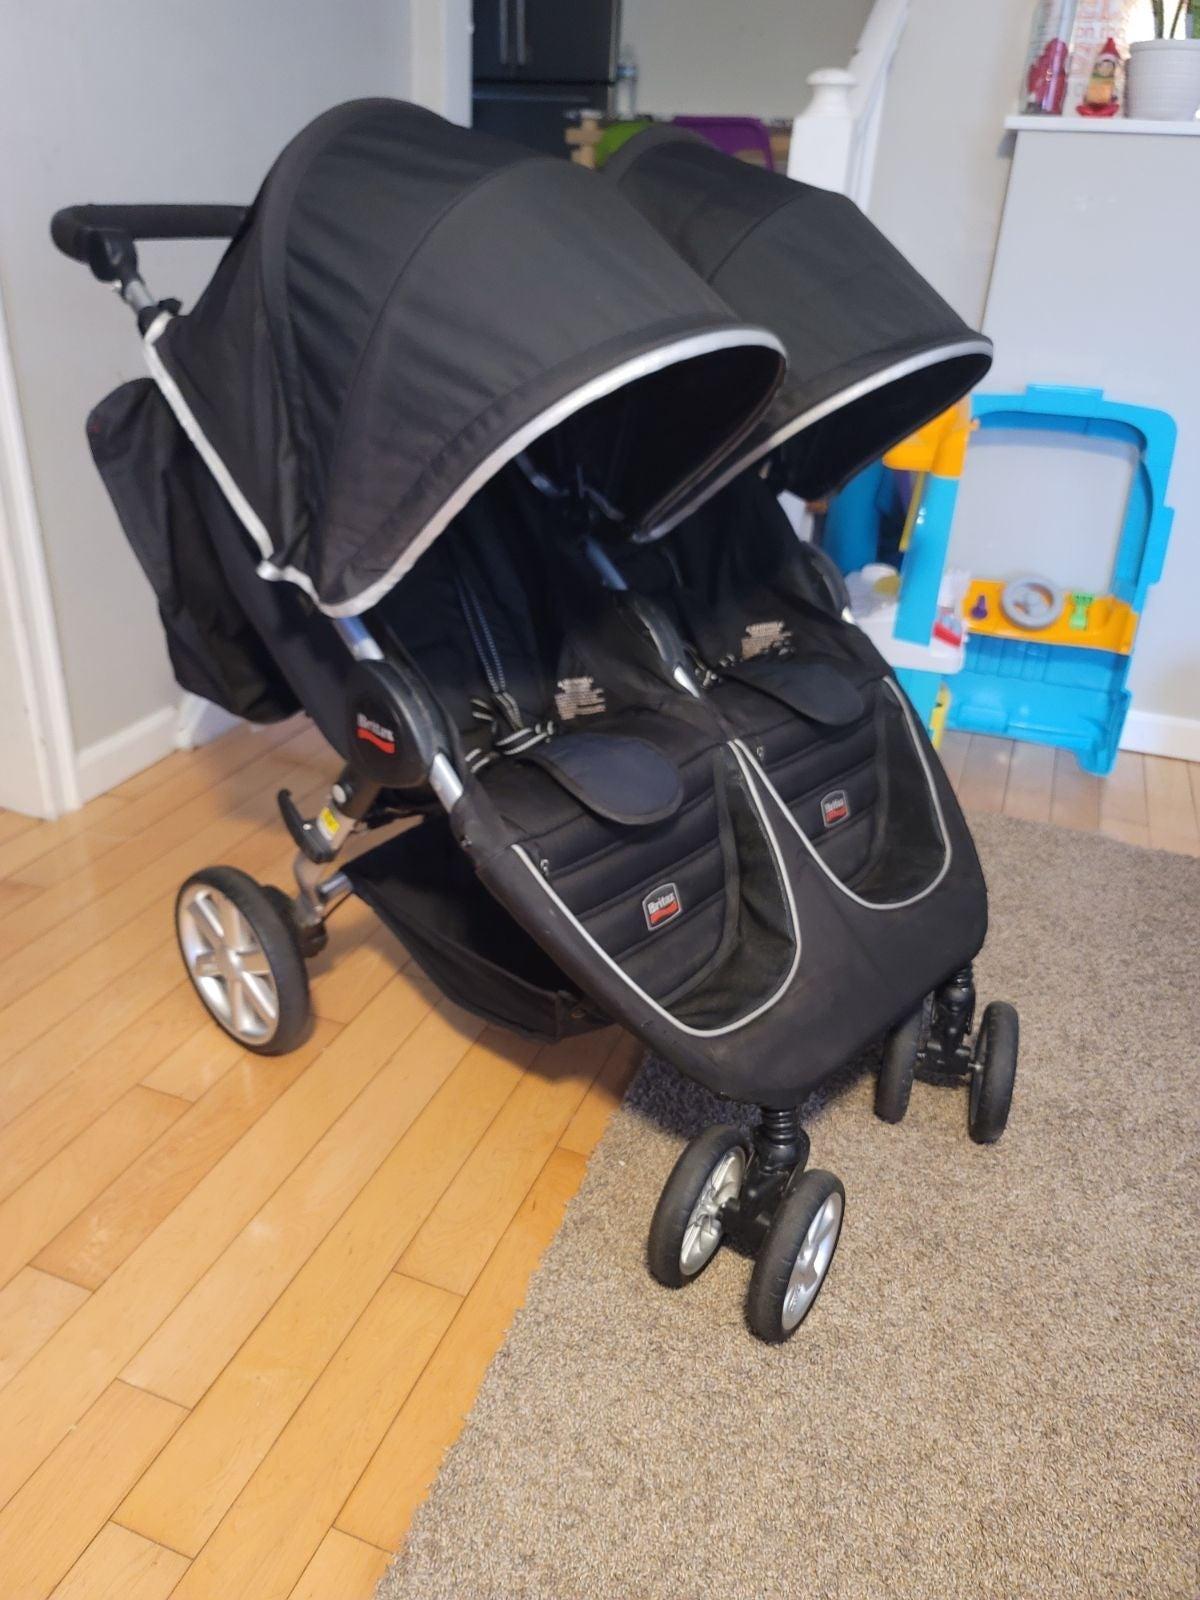 Britax b agile double stroller